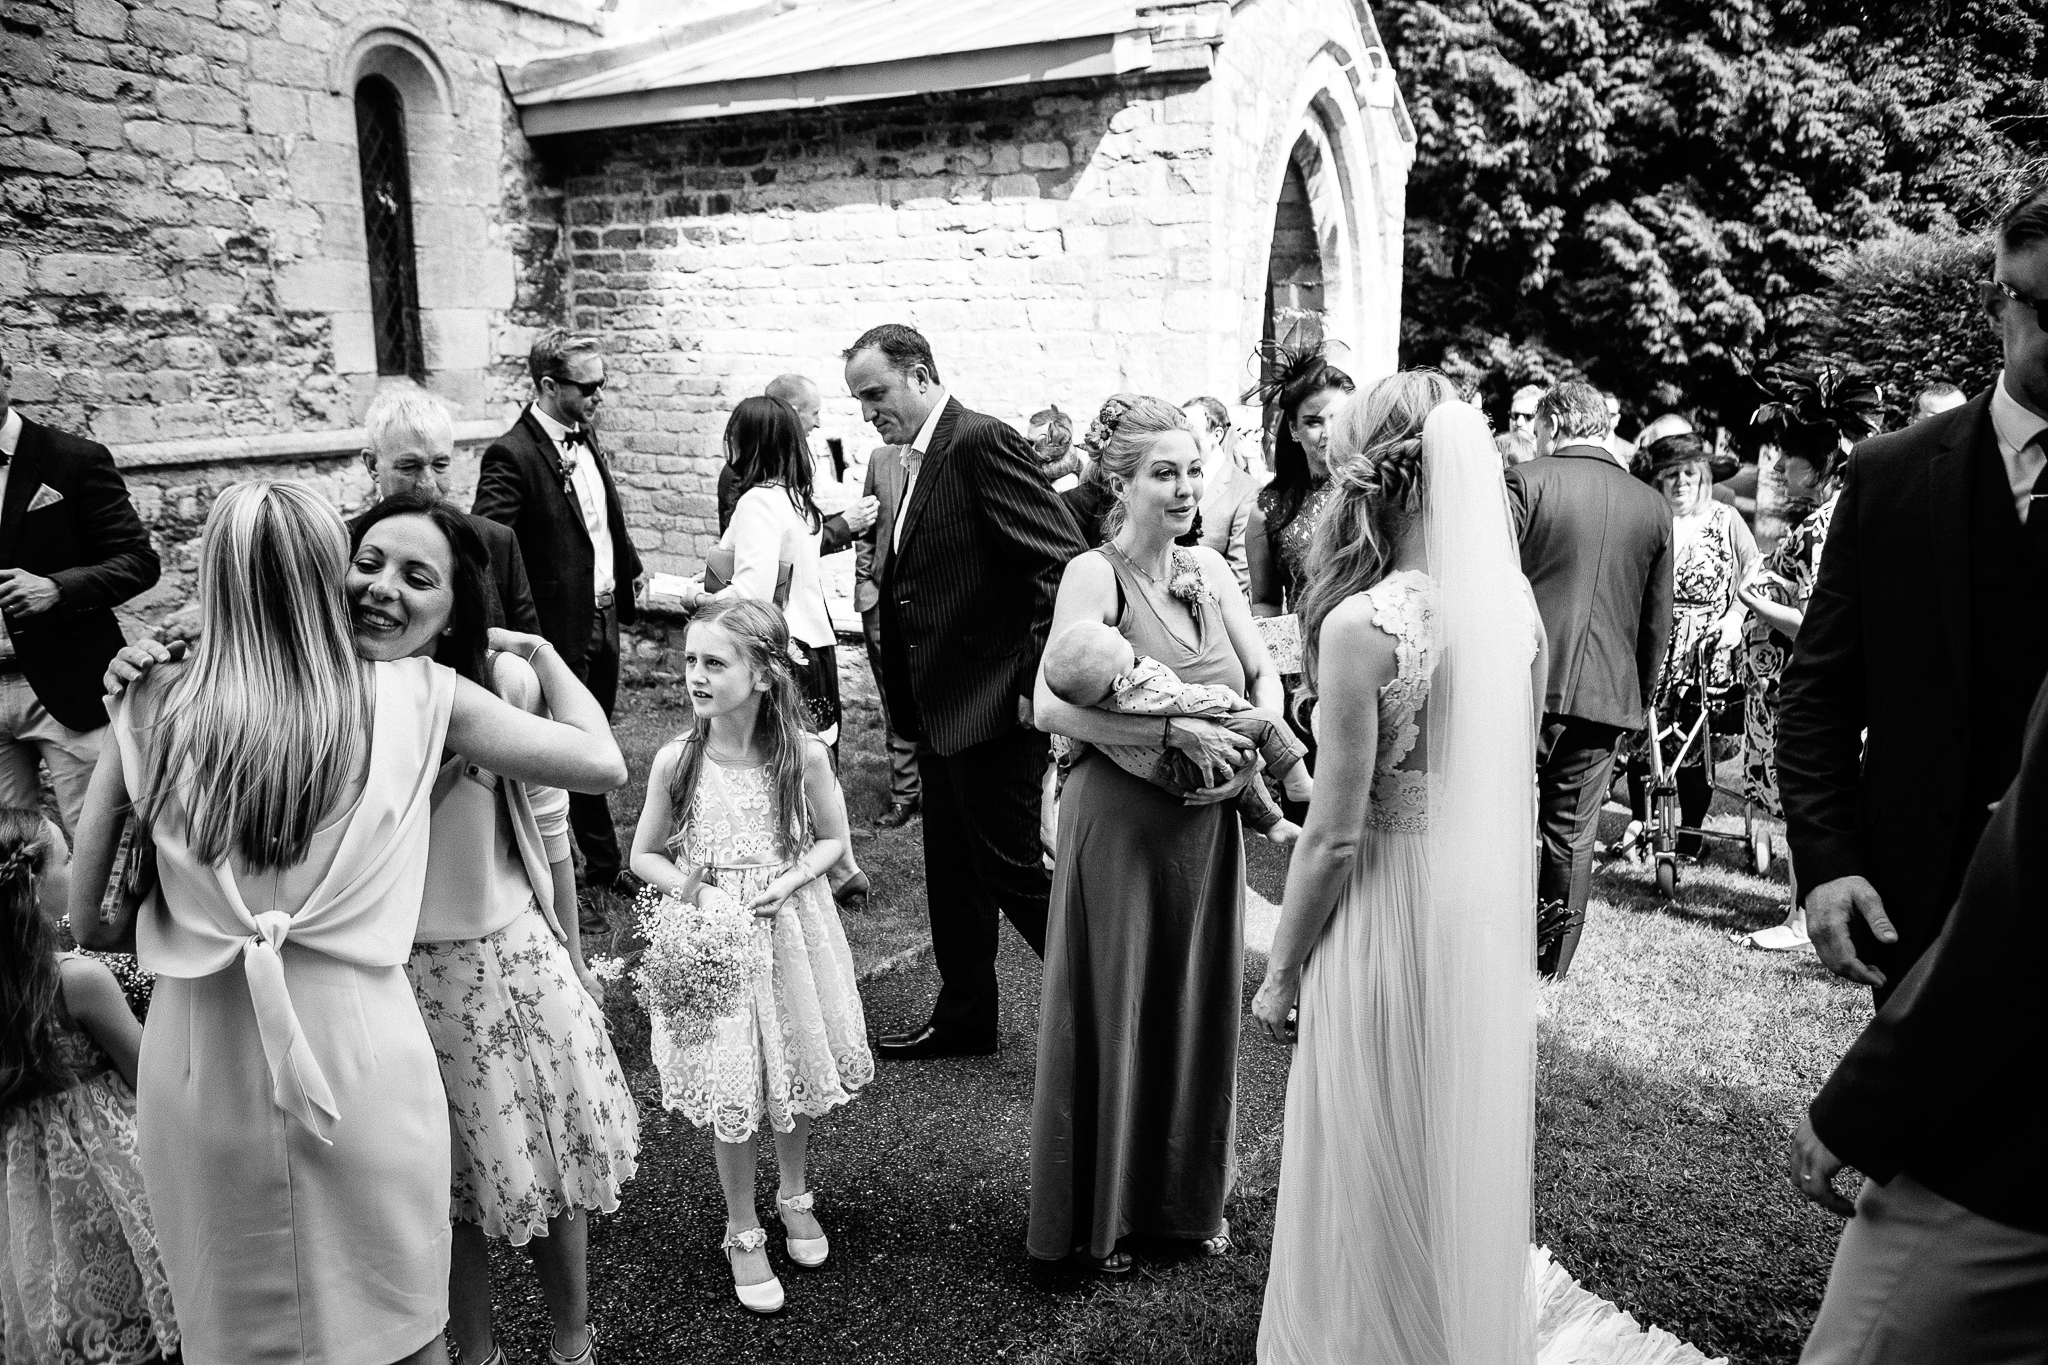 grantham_wedding_photographer-61.jpg